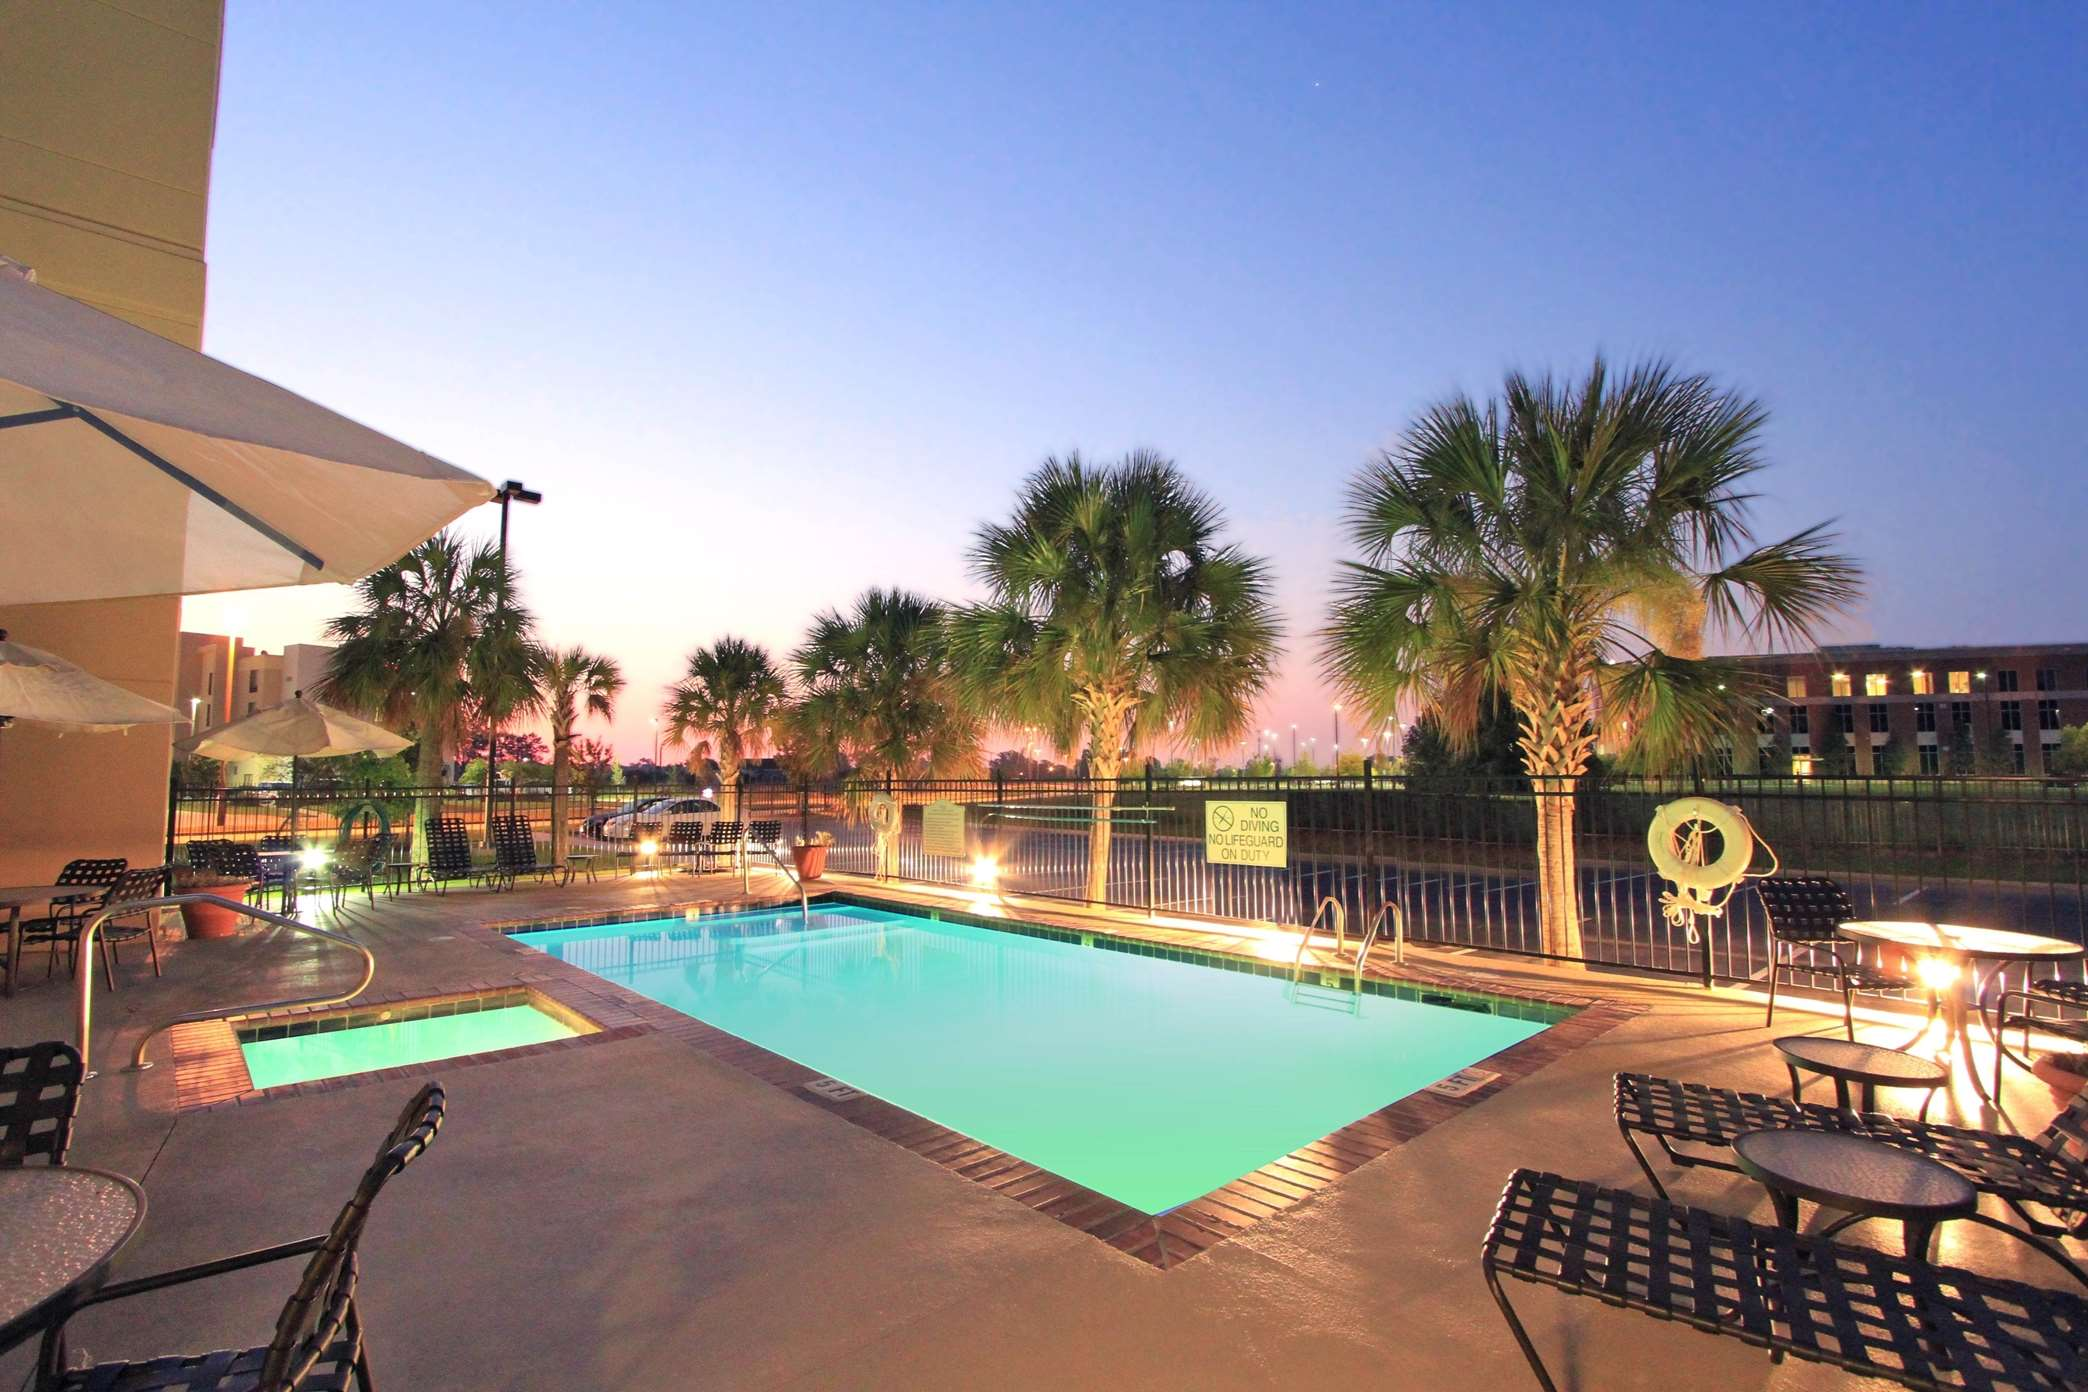 Hilton Garden Inn Baton Rouge Airport image 6